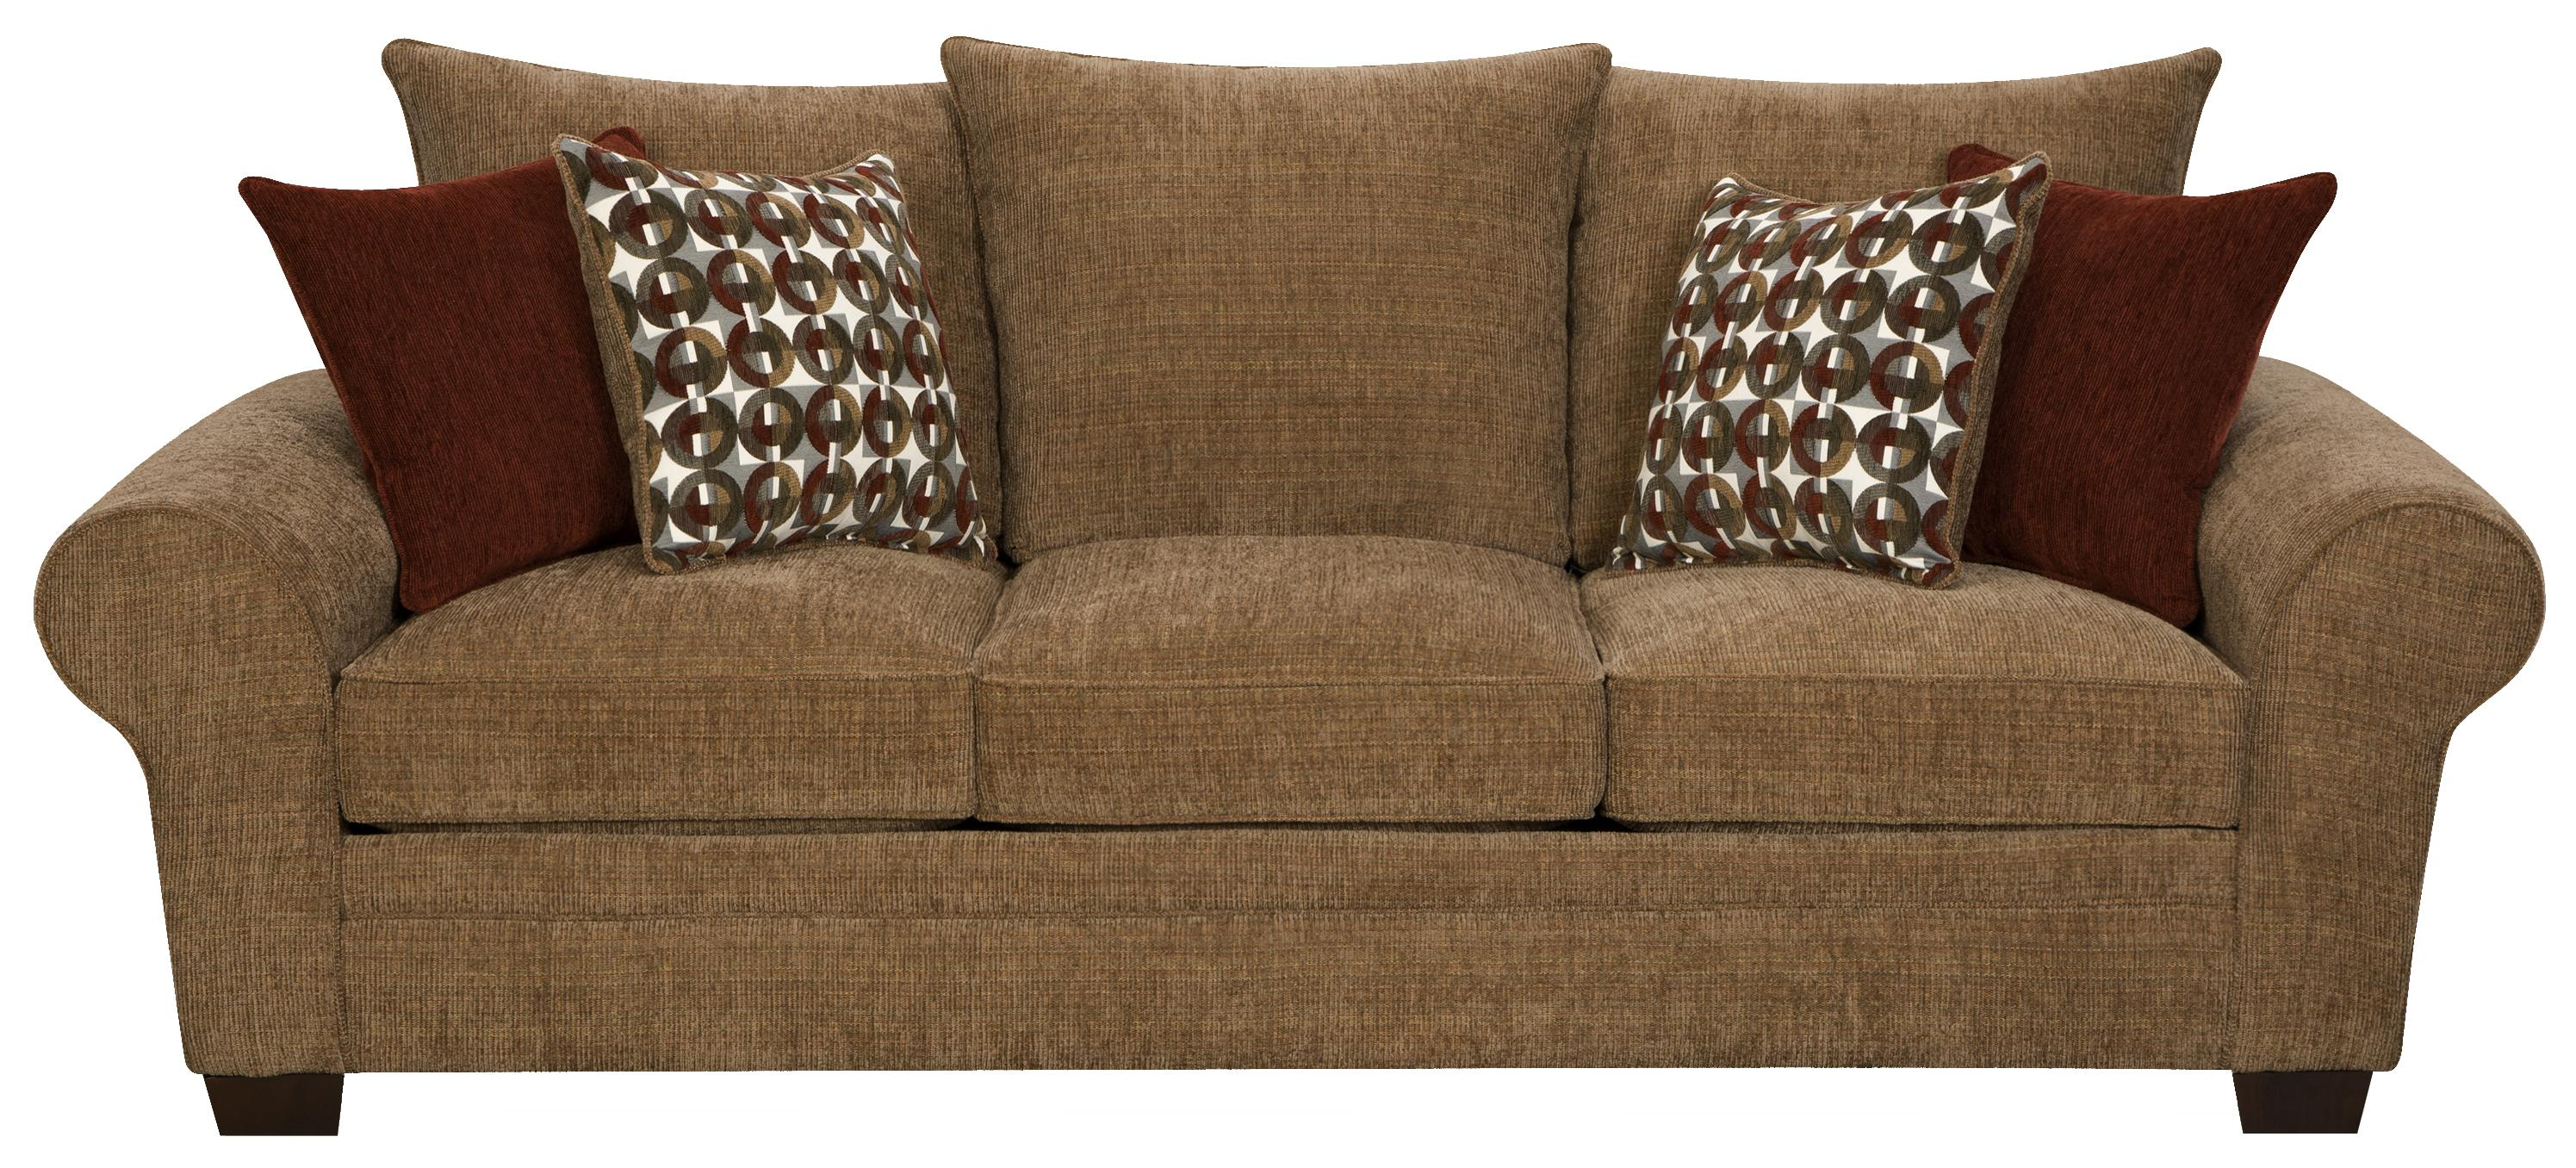 Corinthian 5460 Elegant and Casual Living Room Sofa for